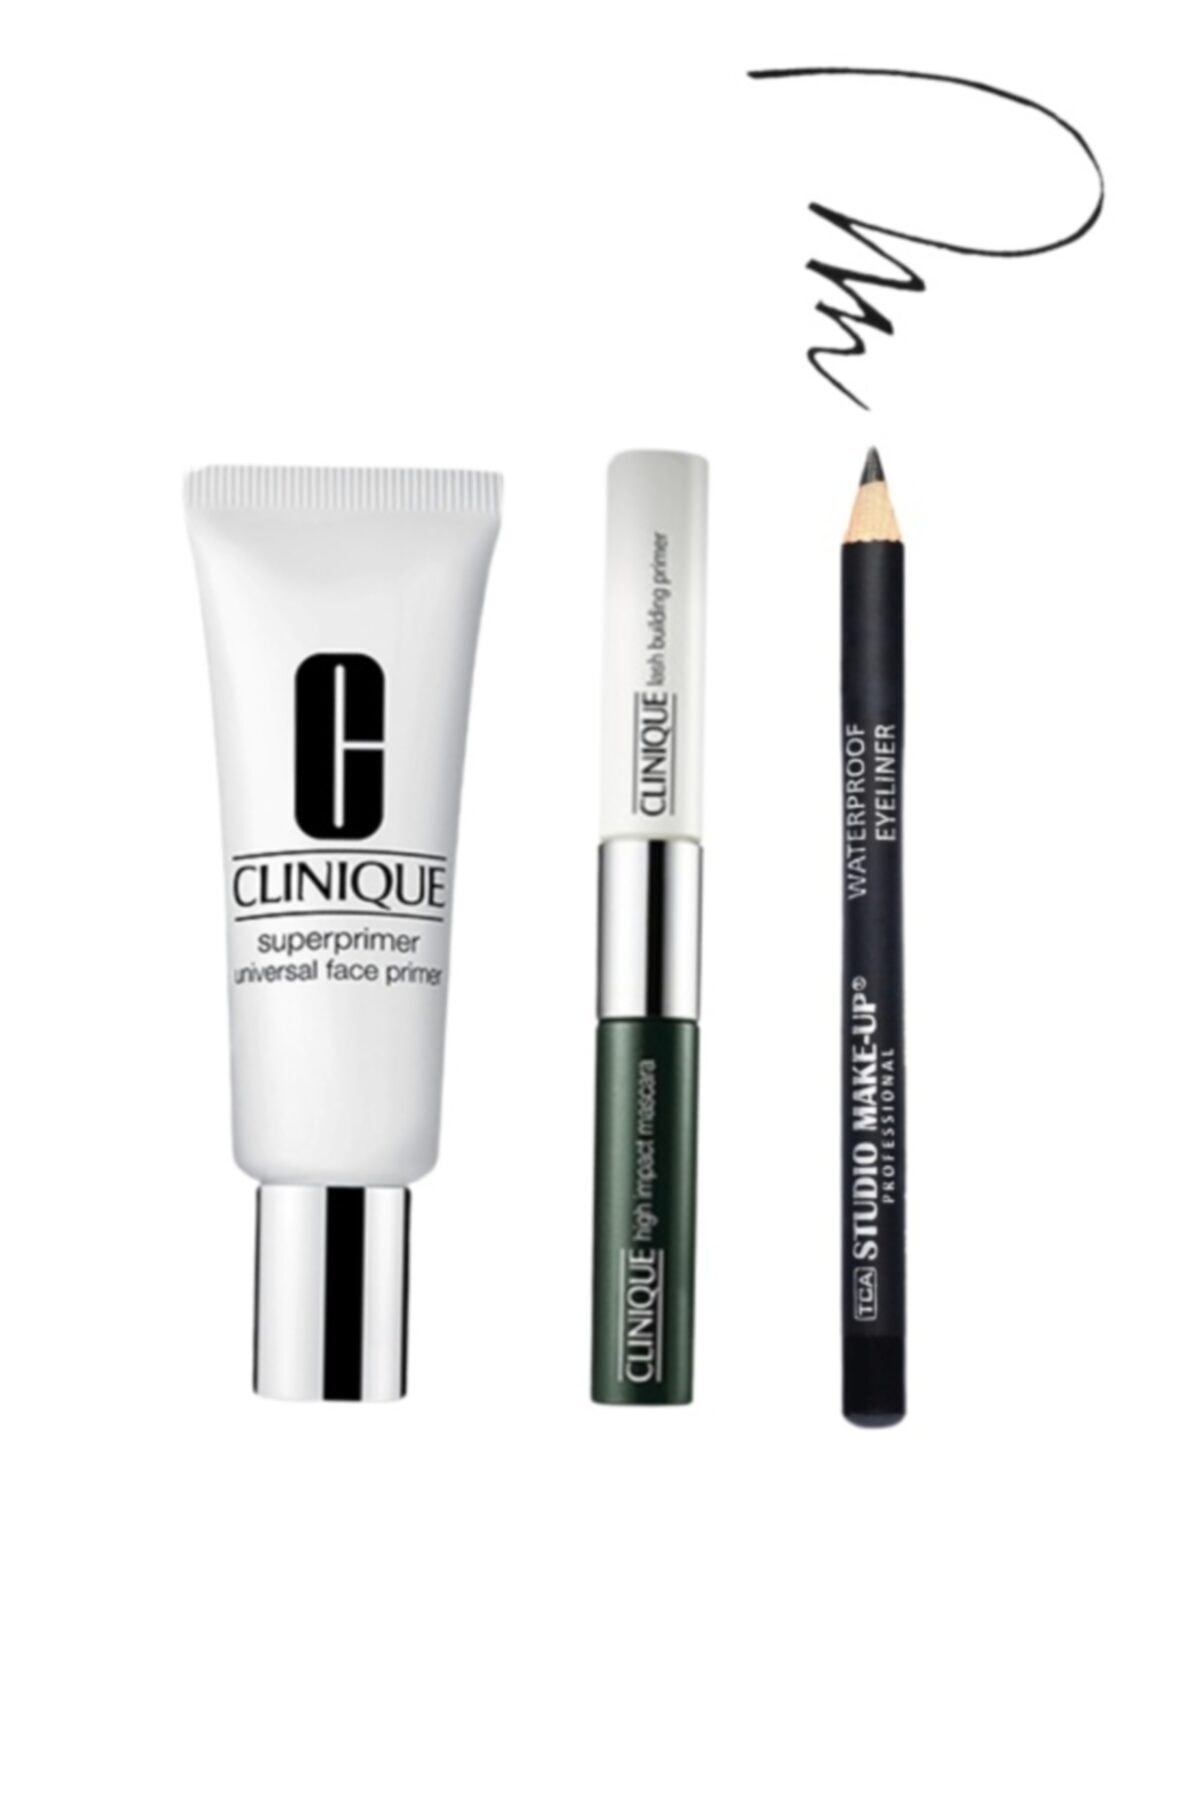 Clinique Superprimer Makyaj Bazı + High Impact Primer & Maskara + Tca Eyeliner 1